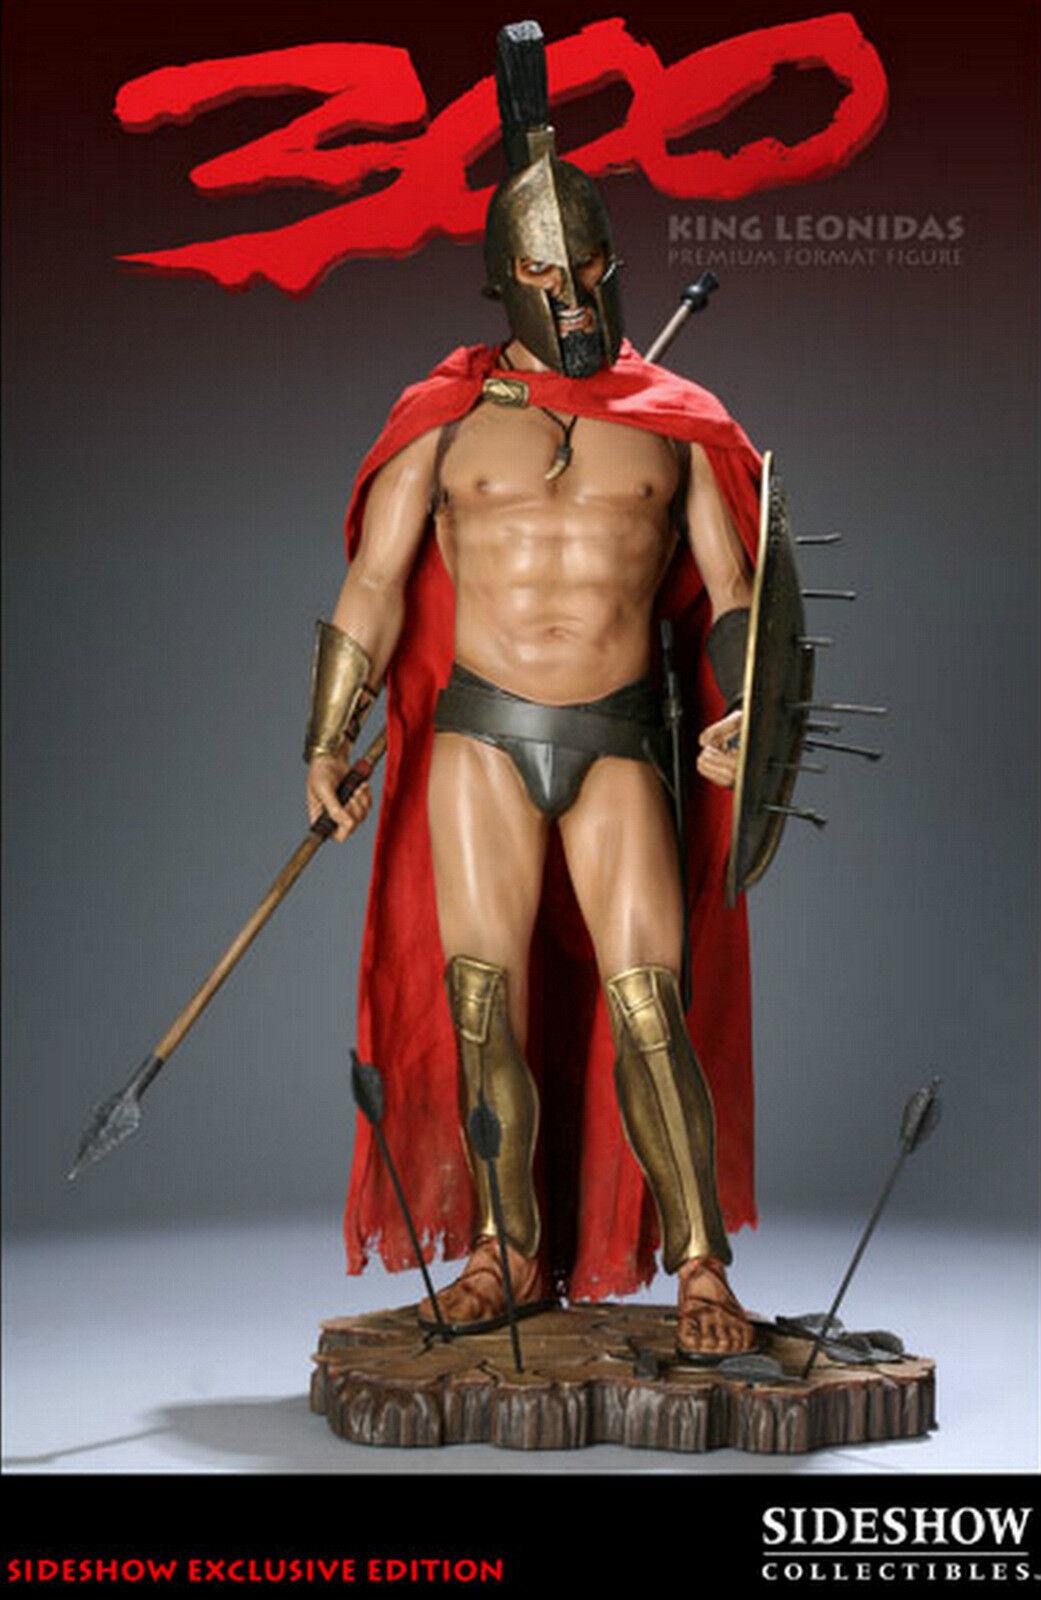 Sideshow 300  King Leonidas Premium Format Maquette Exclusiv Lmt zu 600 Statue  | Gute Qualität